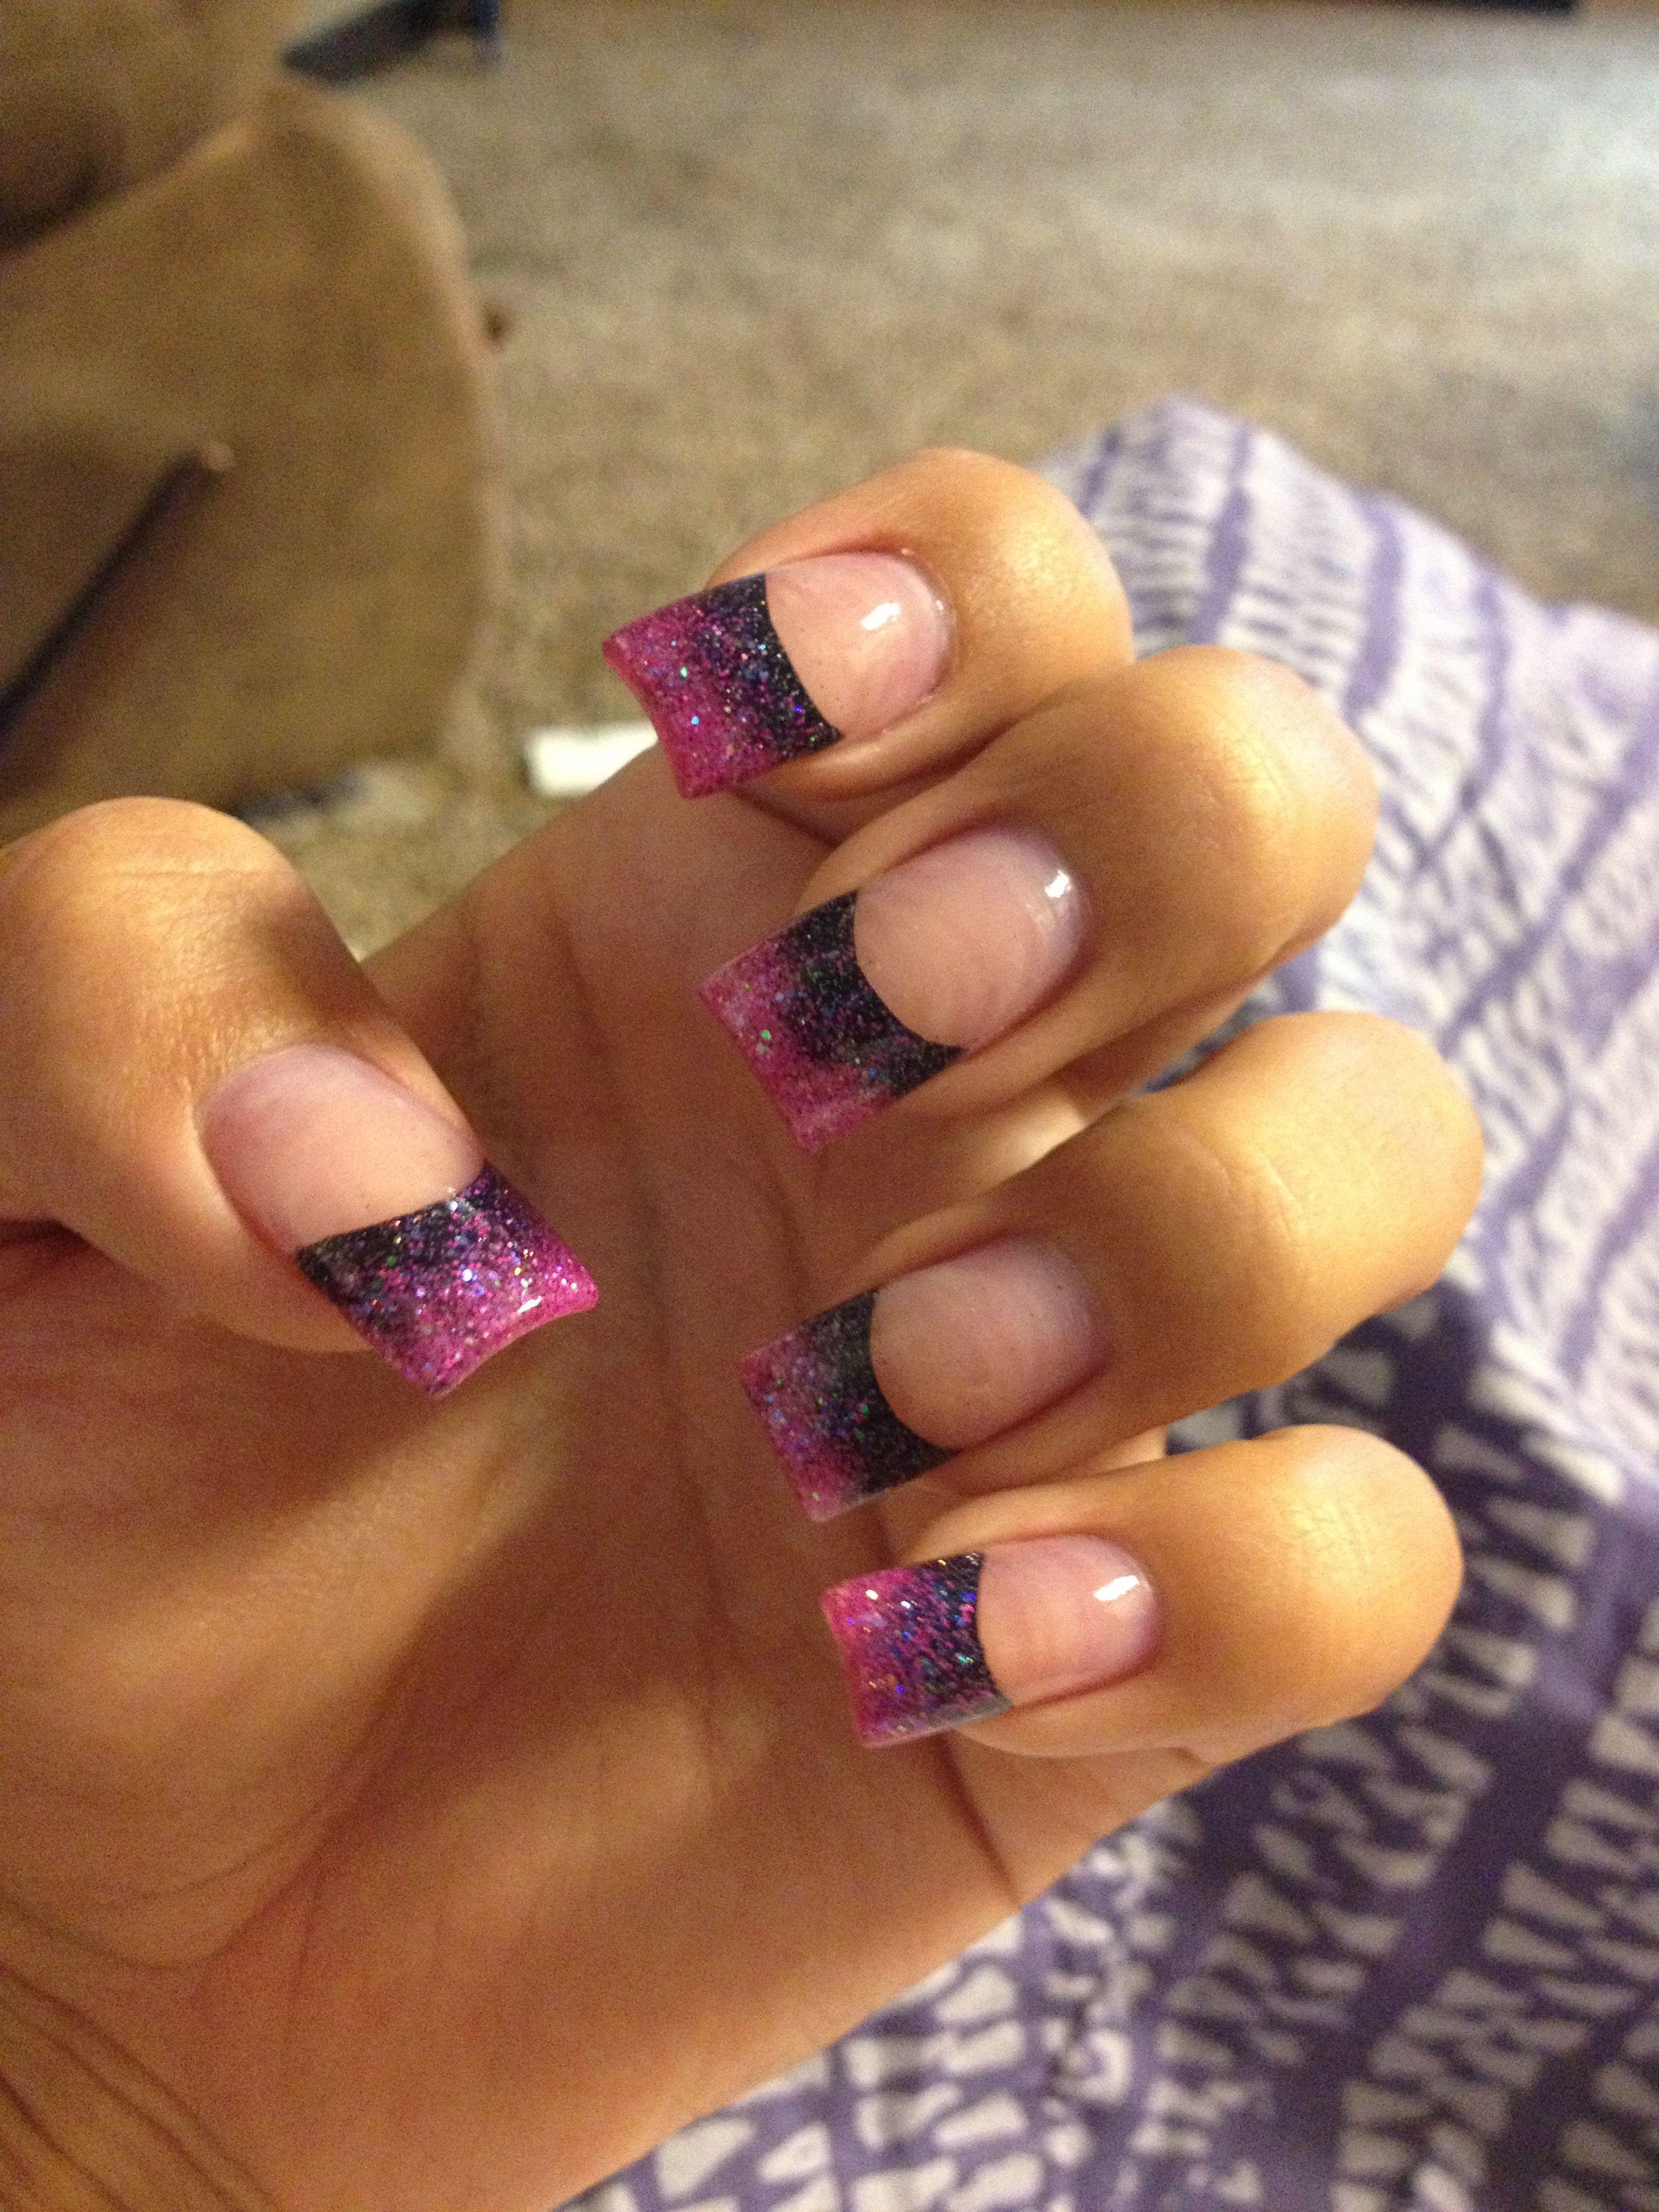 Pin By Trini Bates On Nails Black Acrylic Nails Manicure Nail Designs